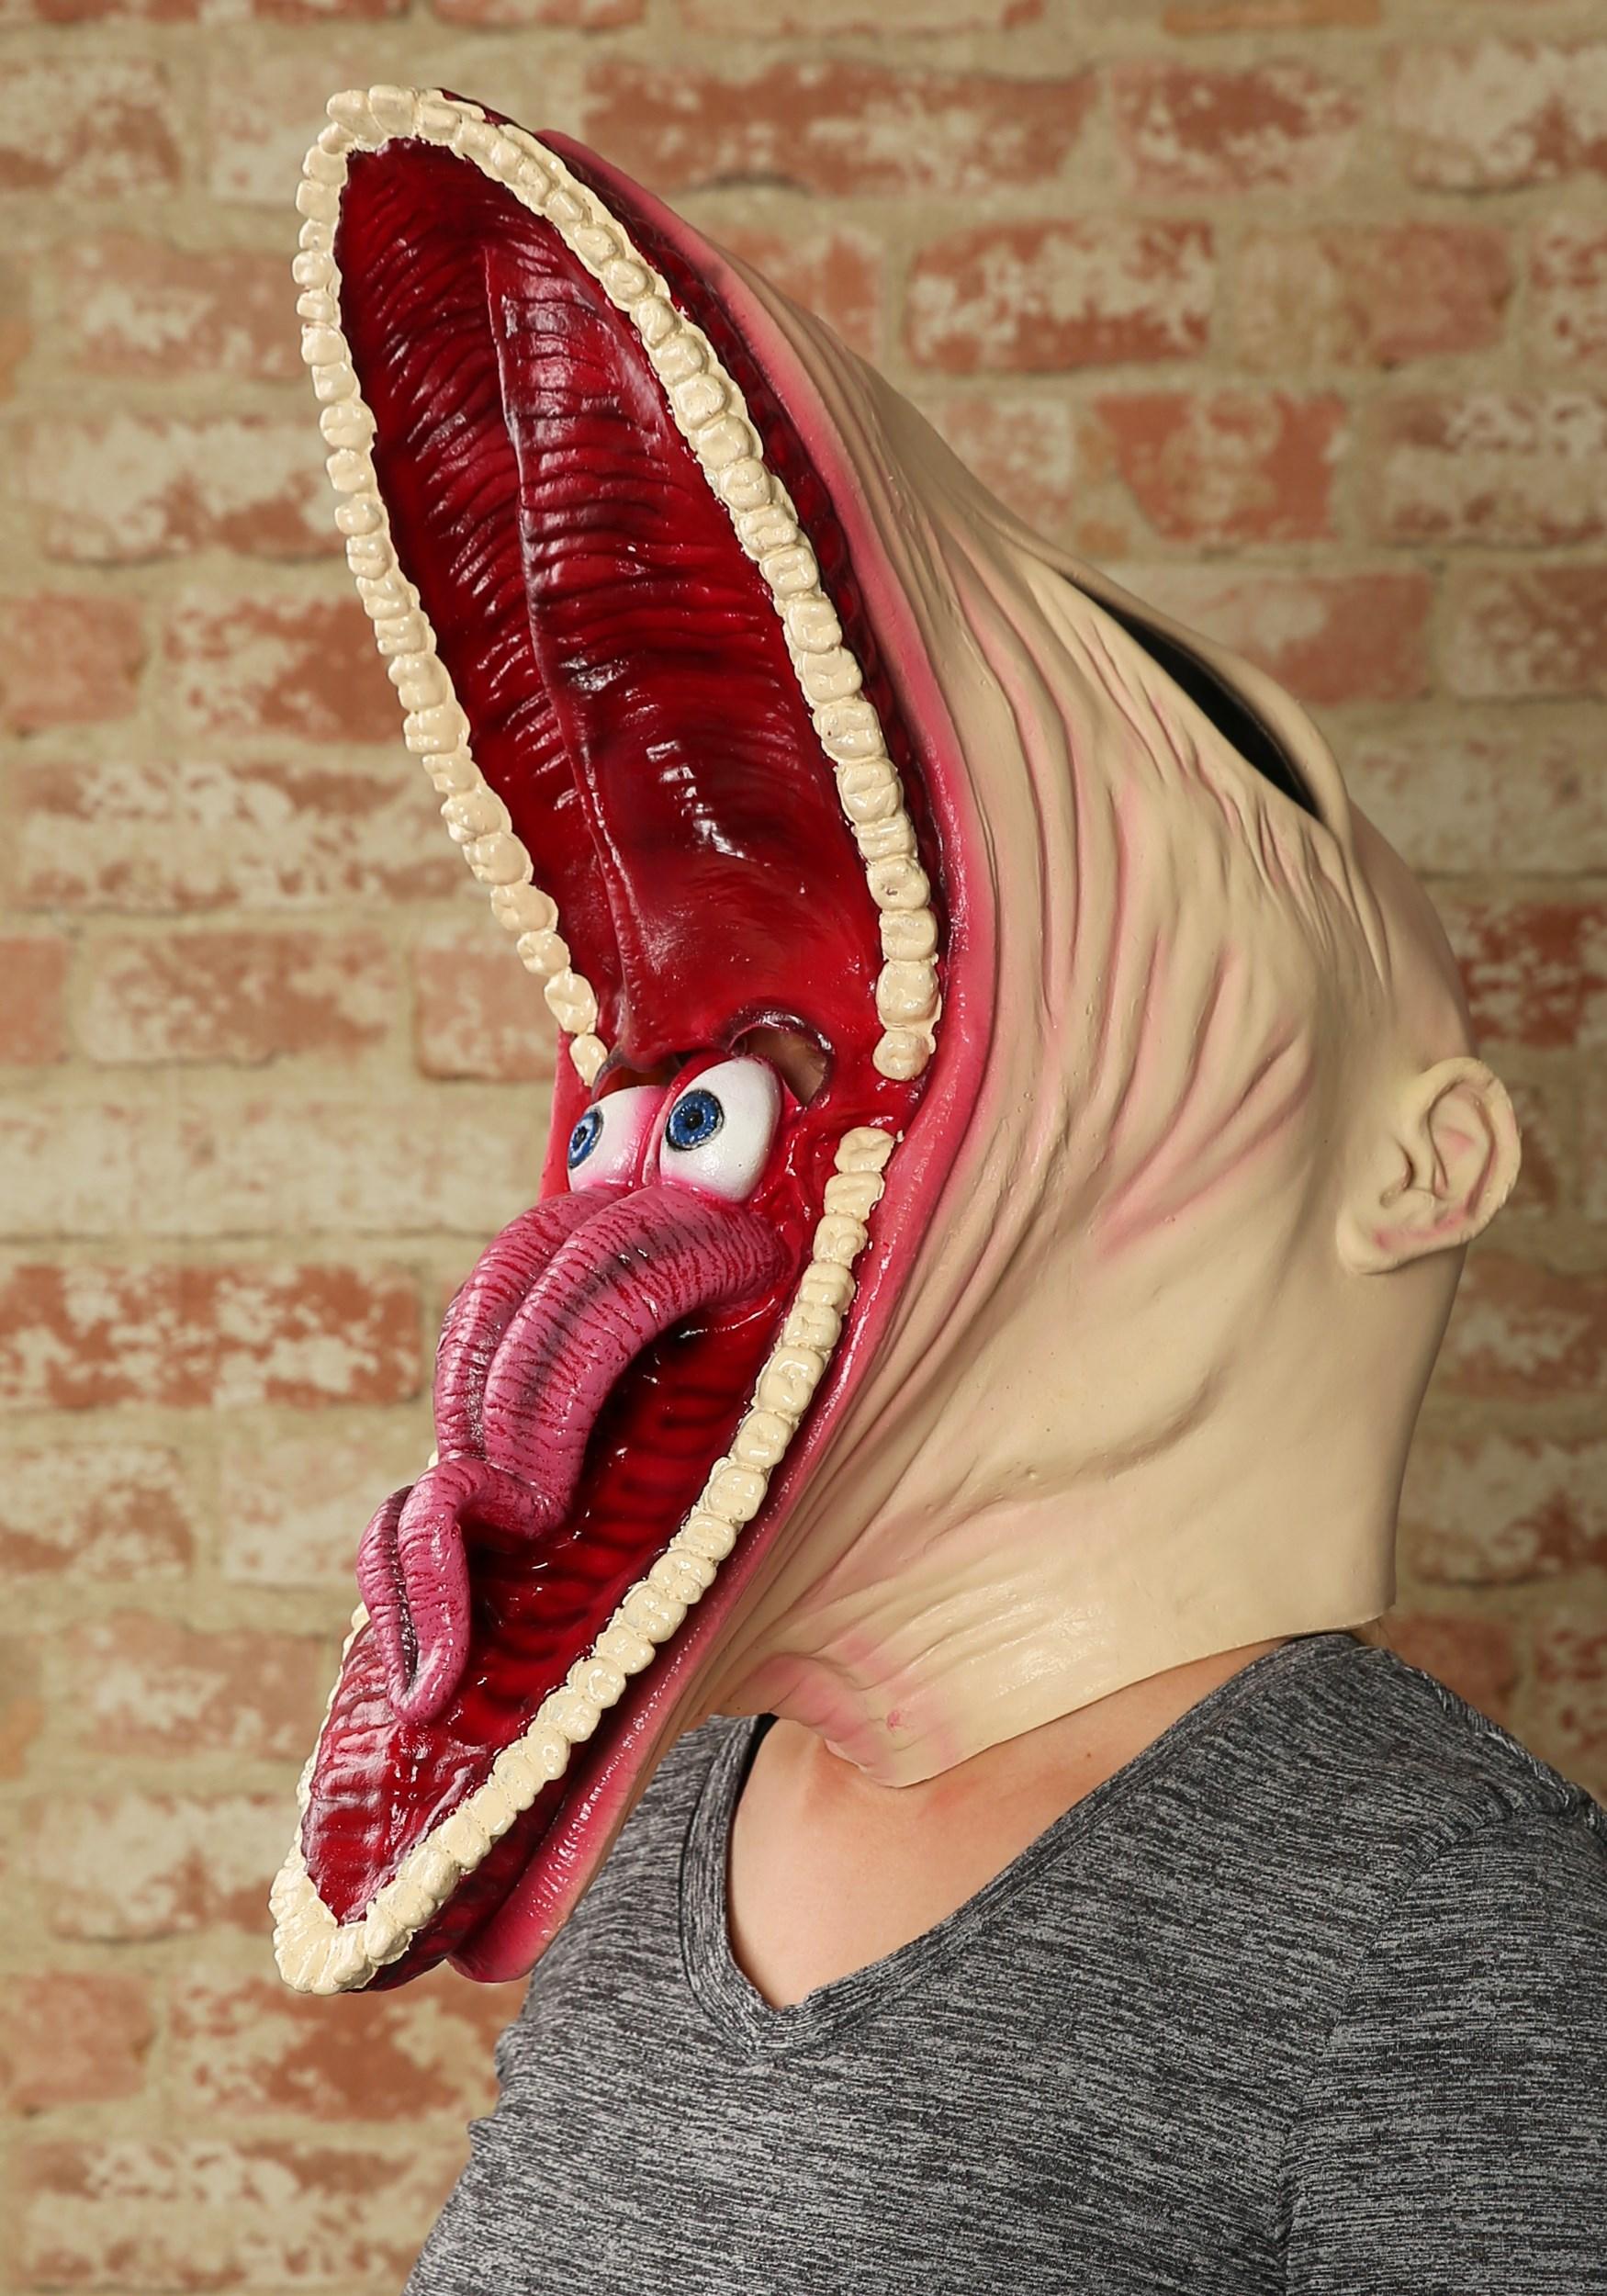 how to make no head costume